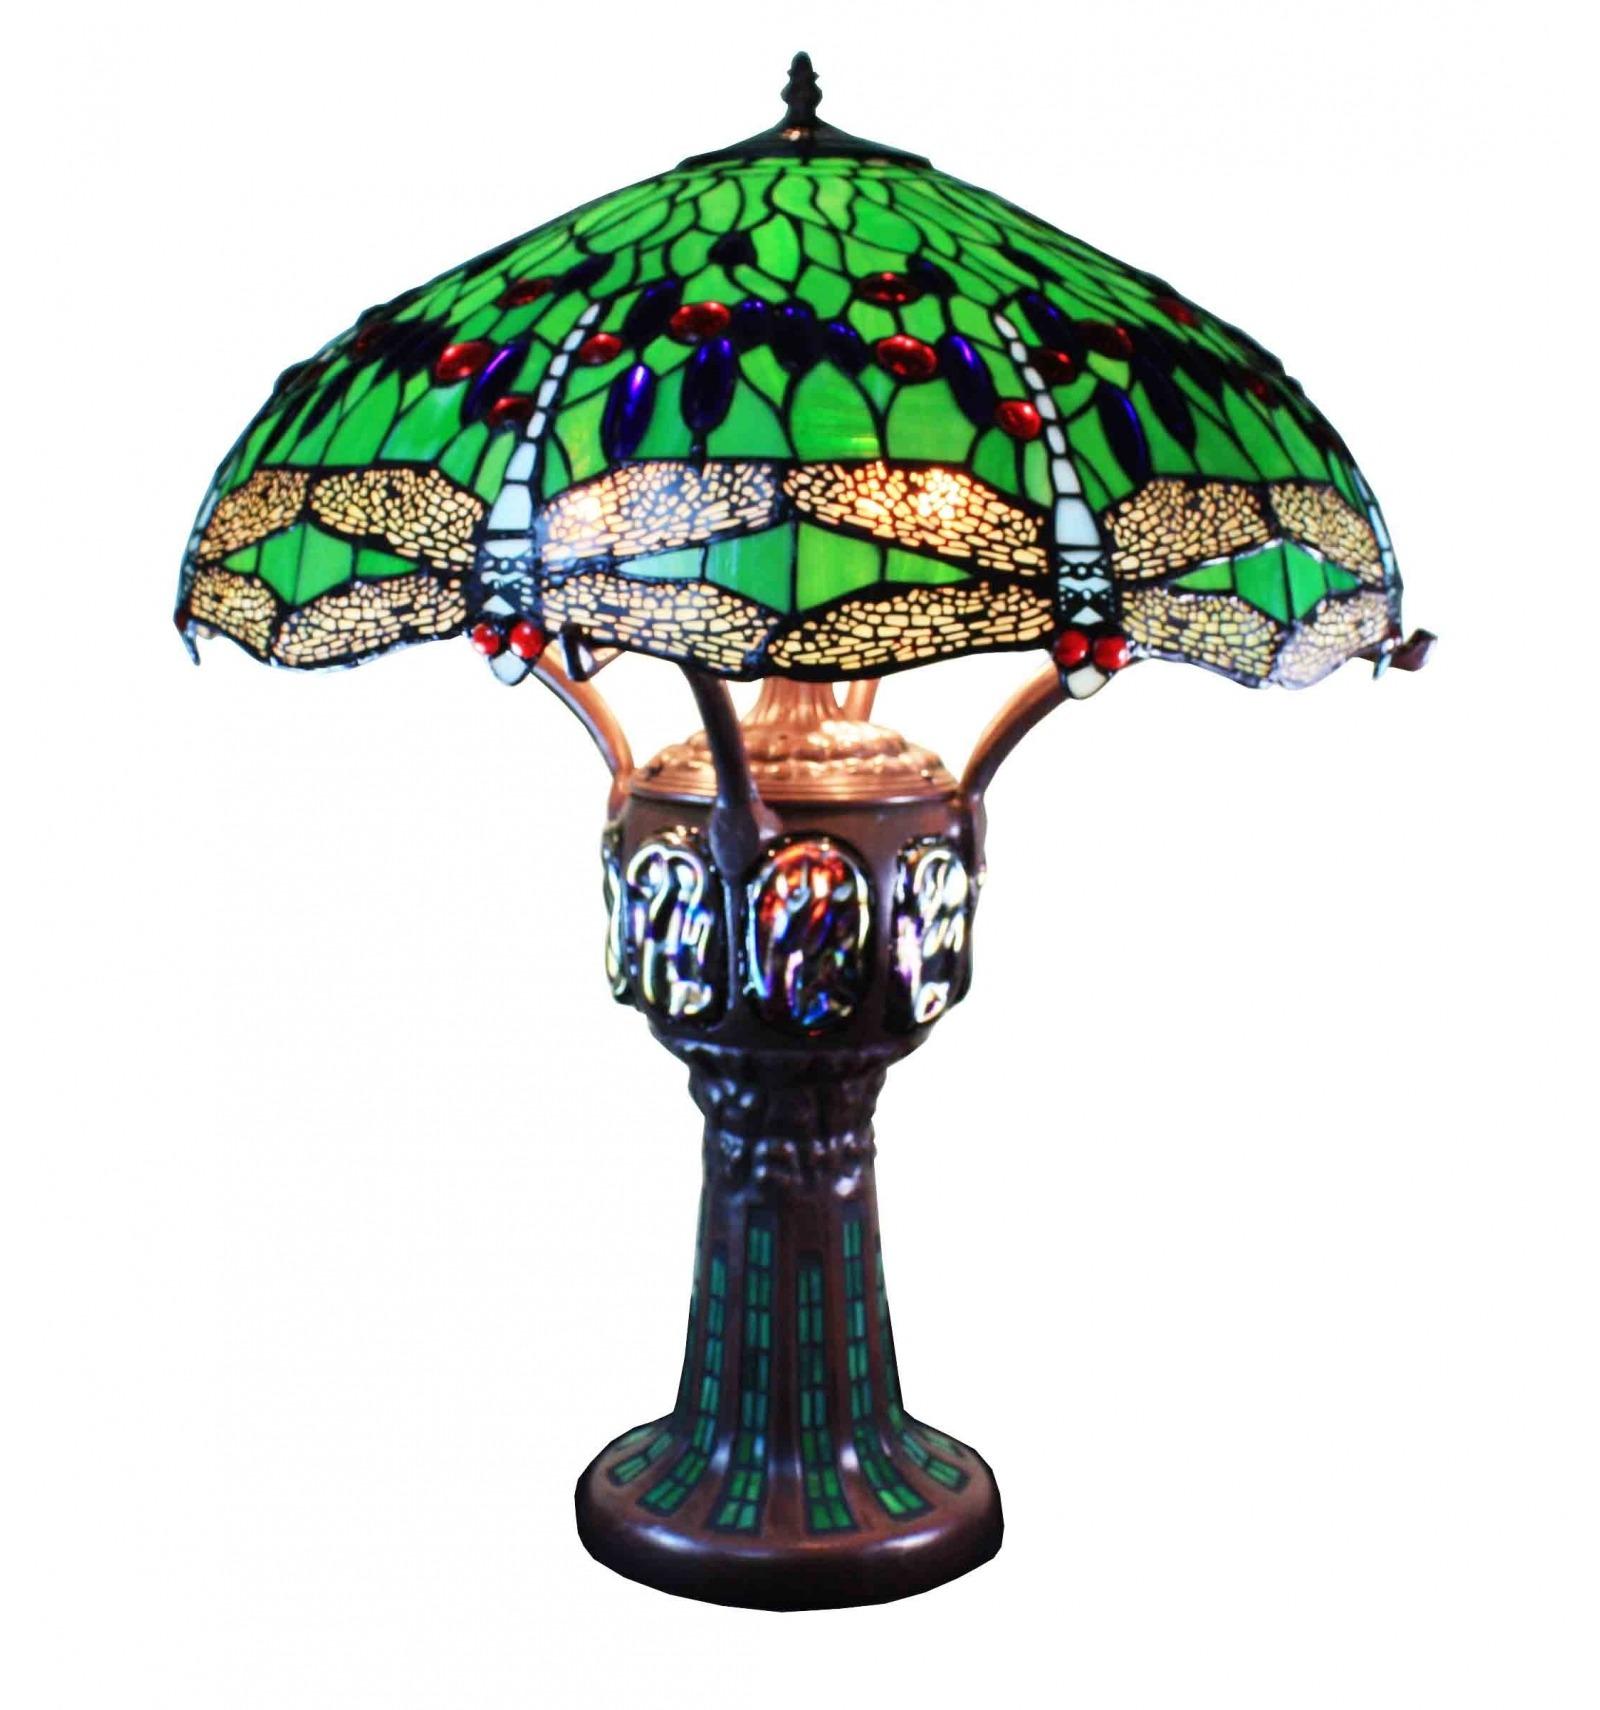 tiffany lampe tischleuchte im tiffany. Black Bedroom Furniture Sets. Home Design Ideas